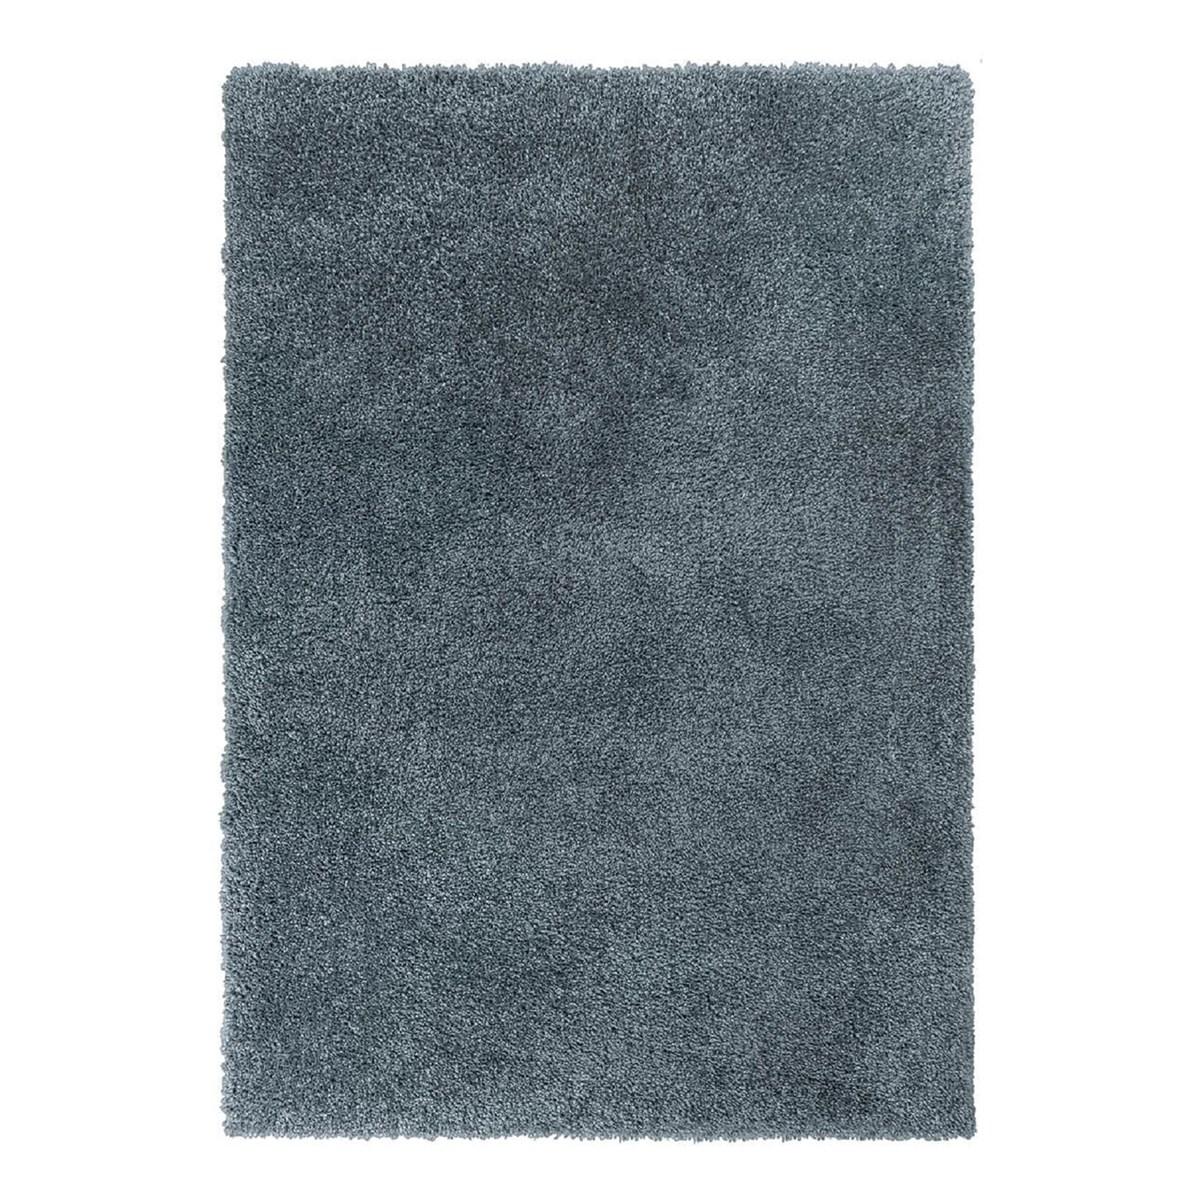 Tapis shaggy en Polyester Bleu 200x290 cm